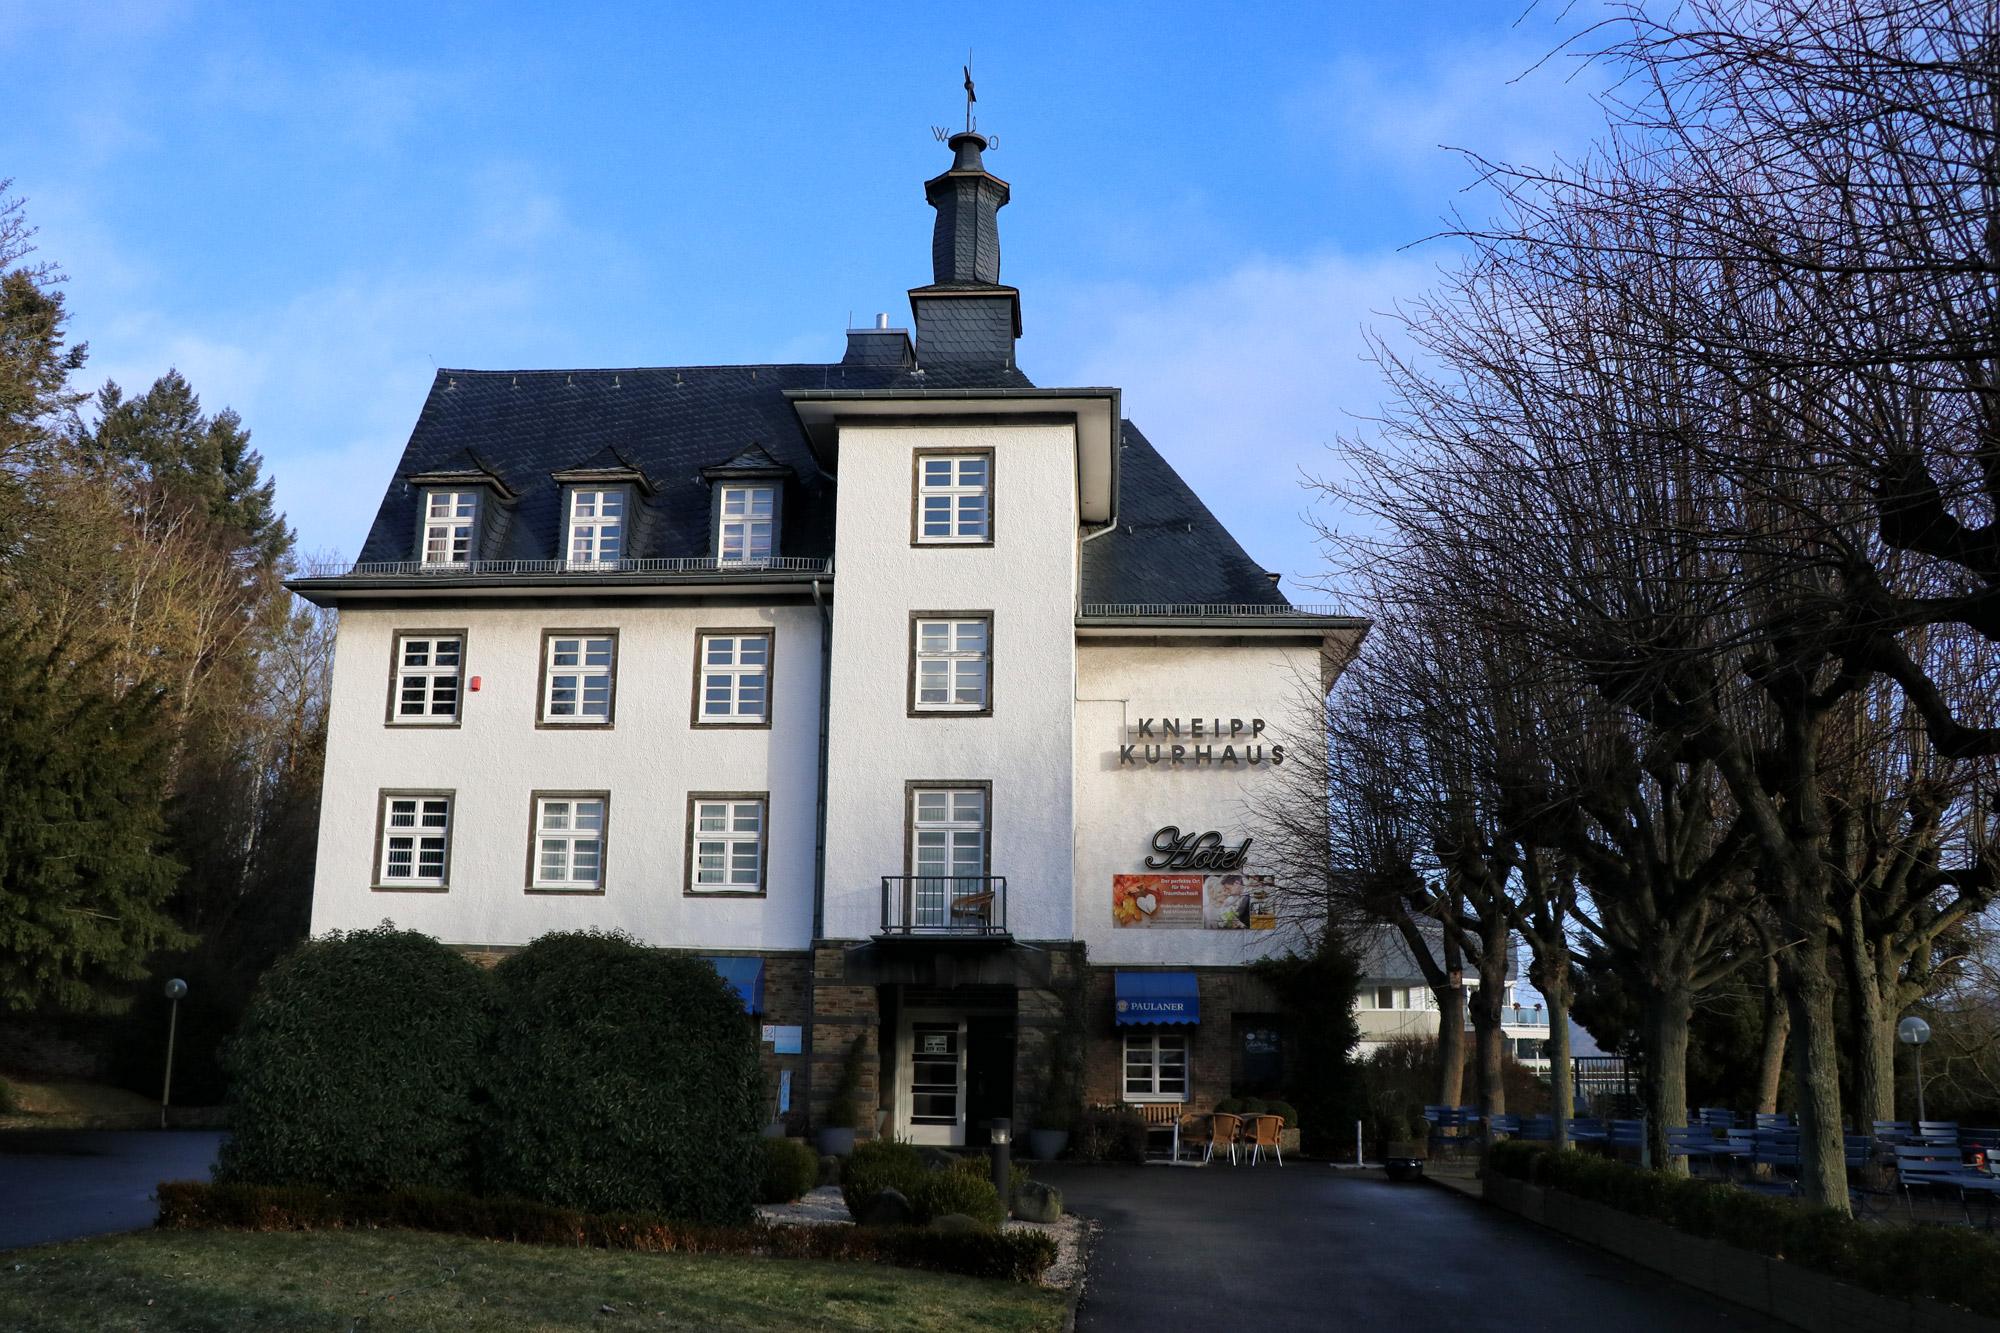 Bad Münstereifel - Kurhaus Hotel